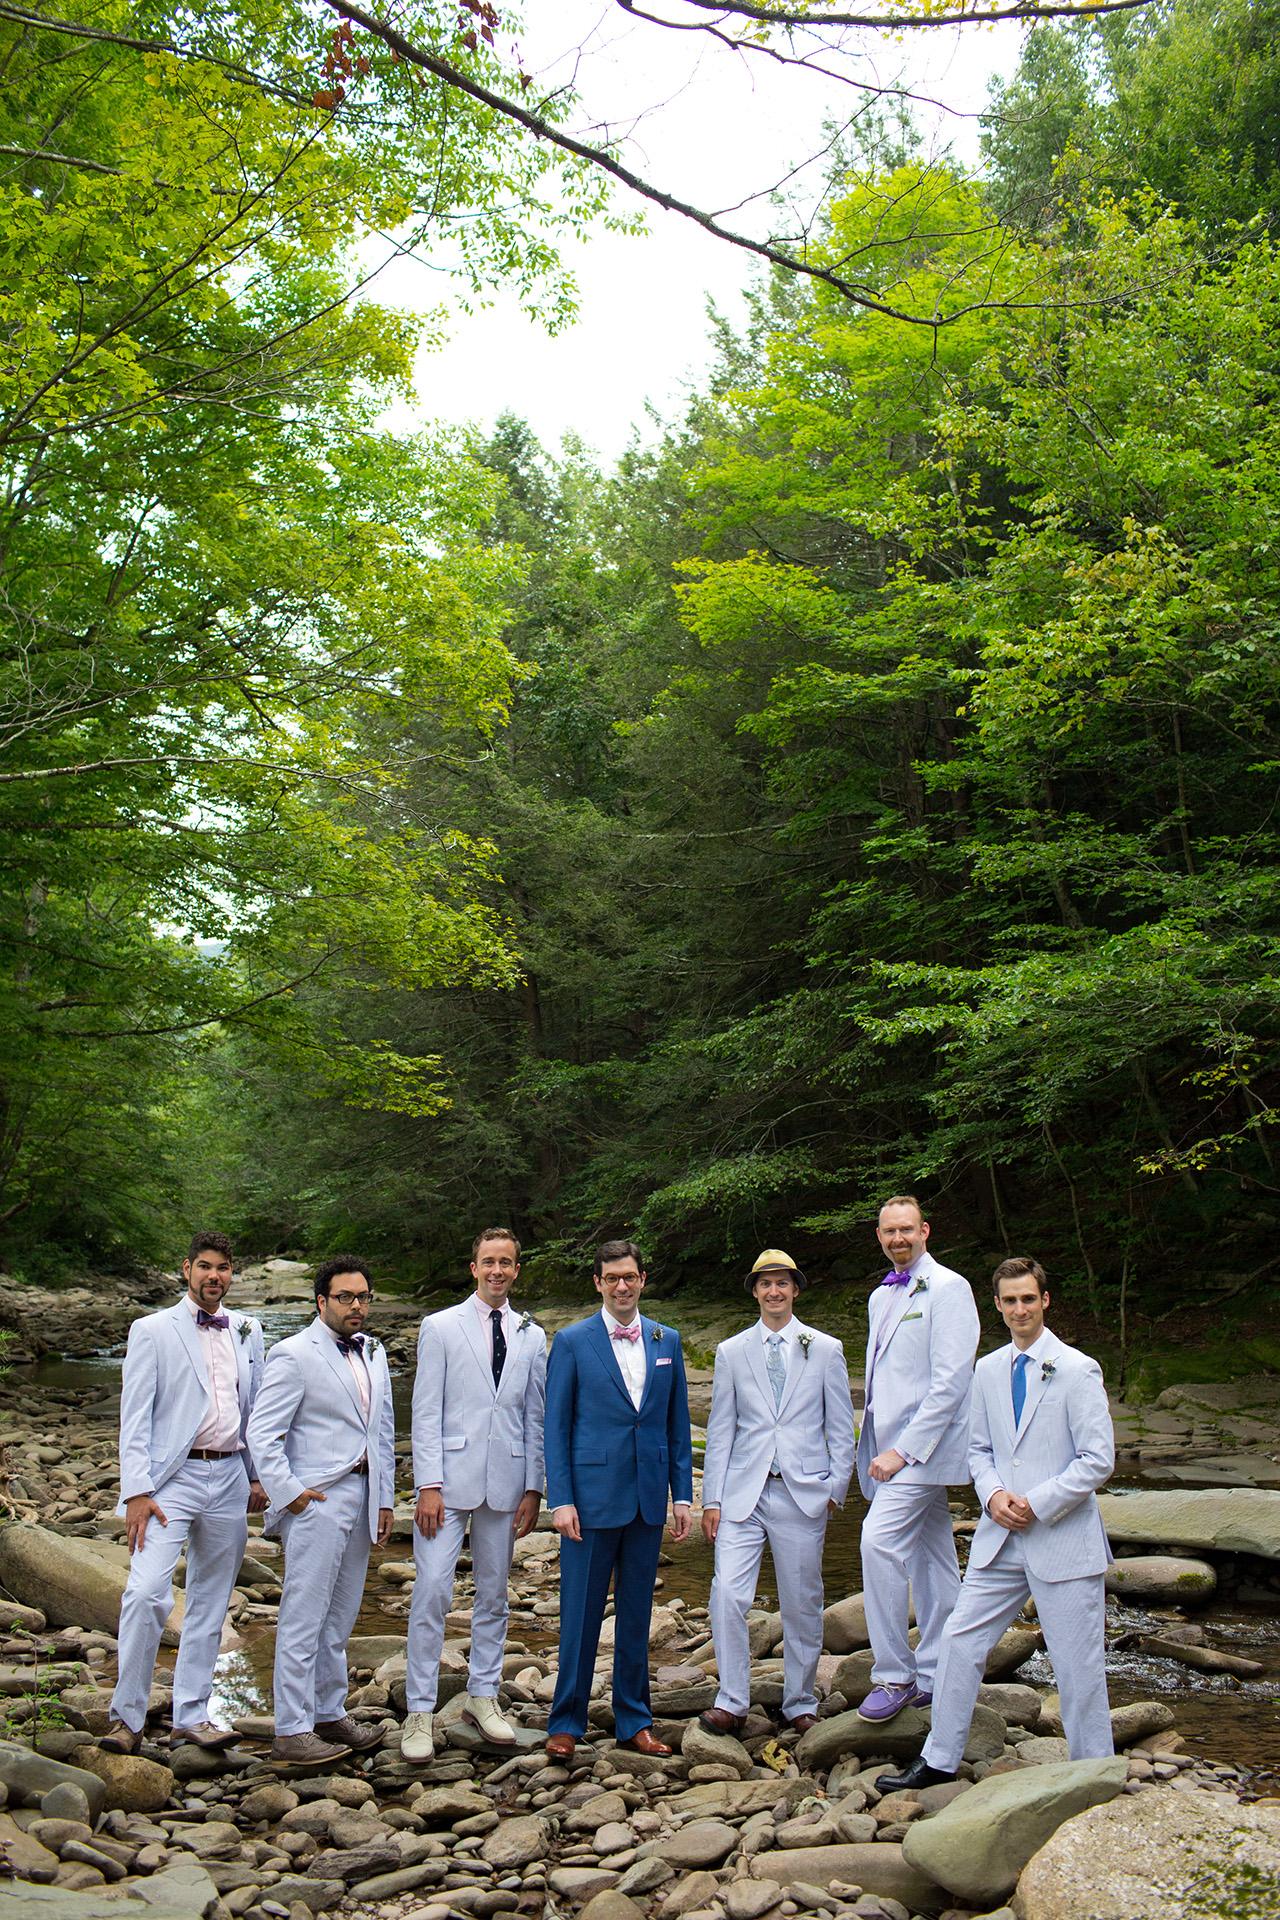 Full_Moon_Resort_NY_Wedding_CP_CS__149